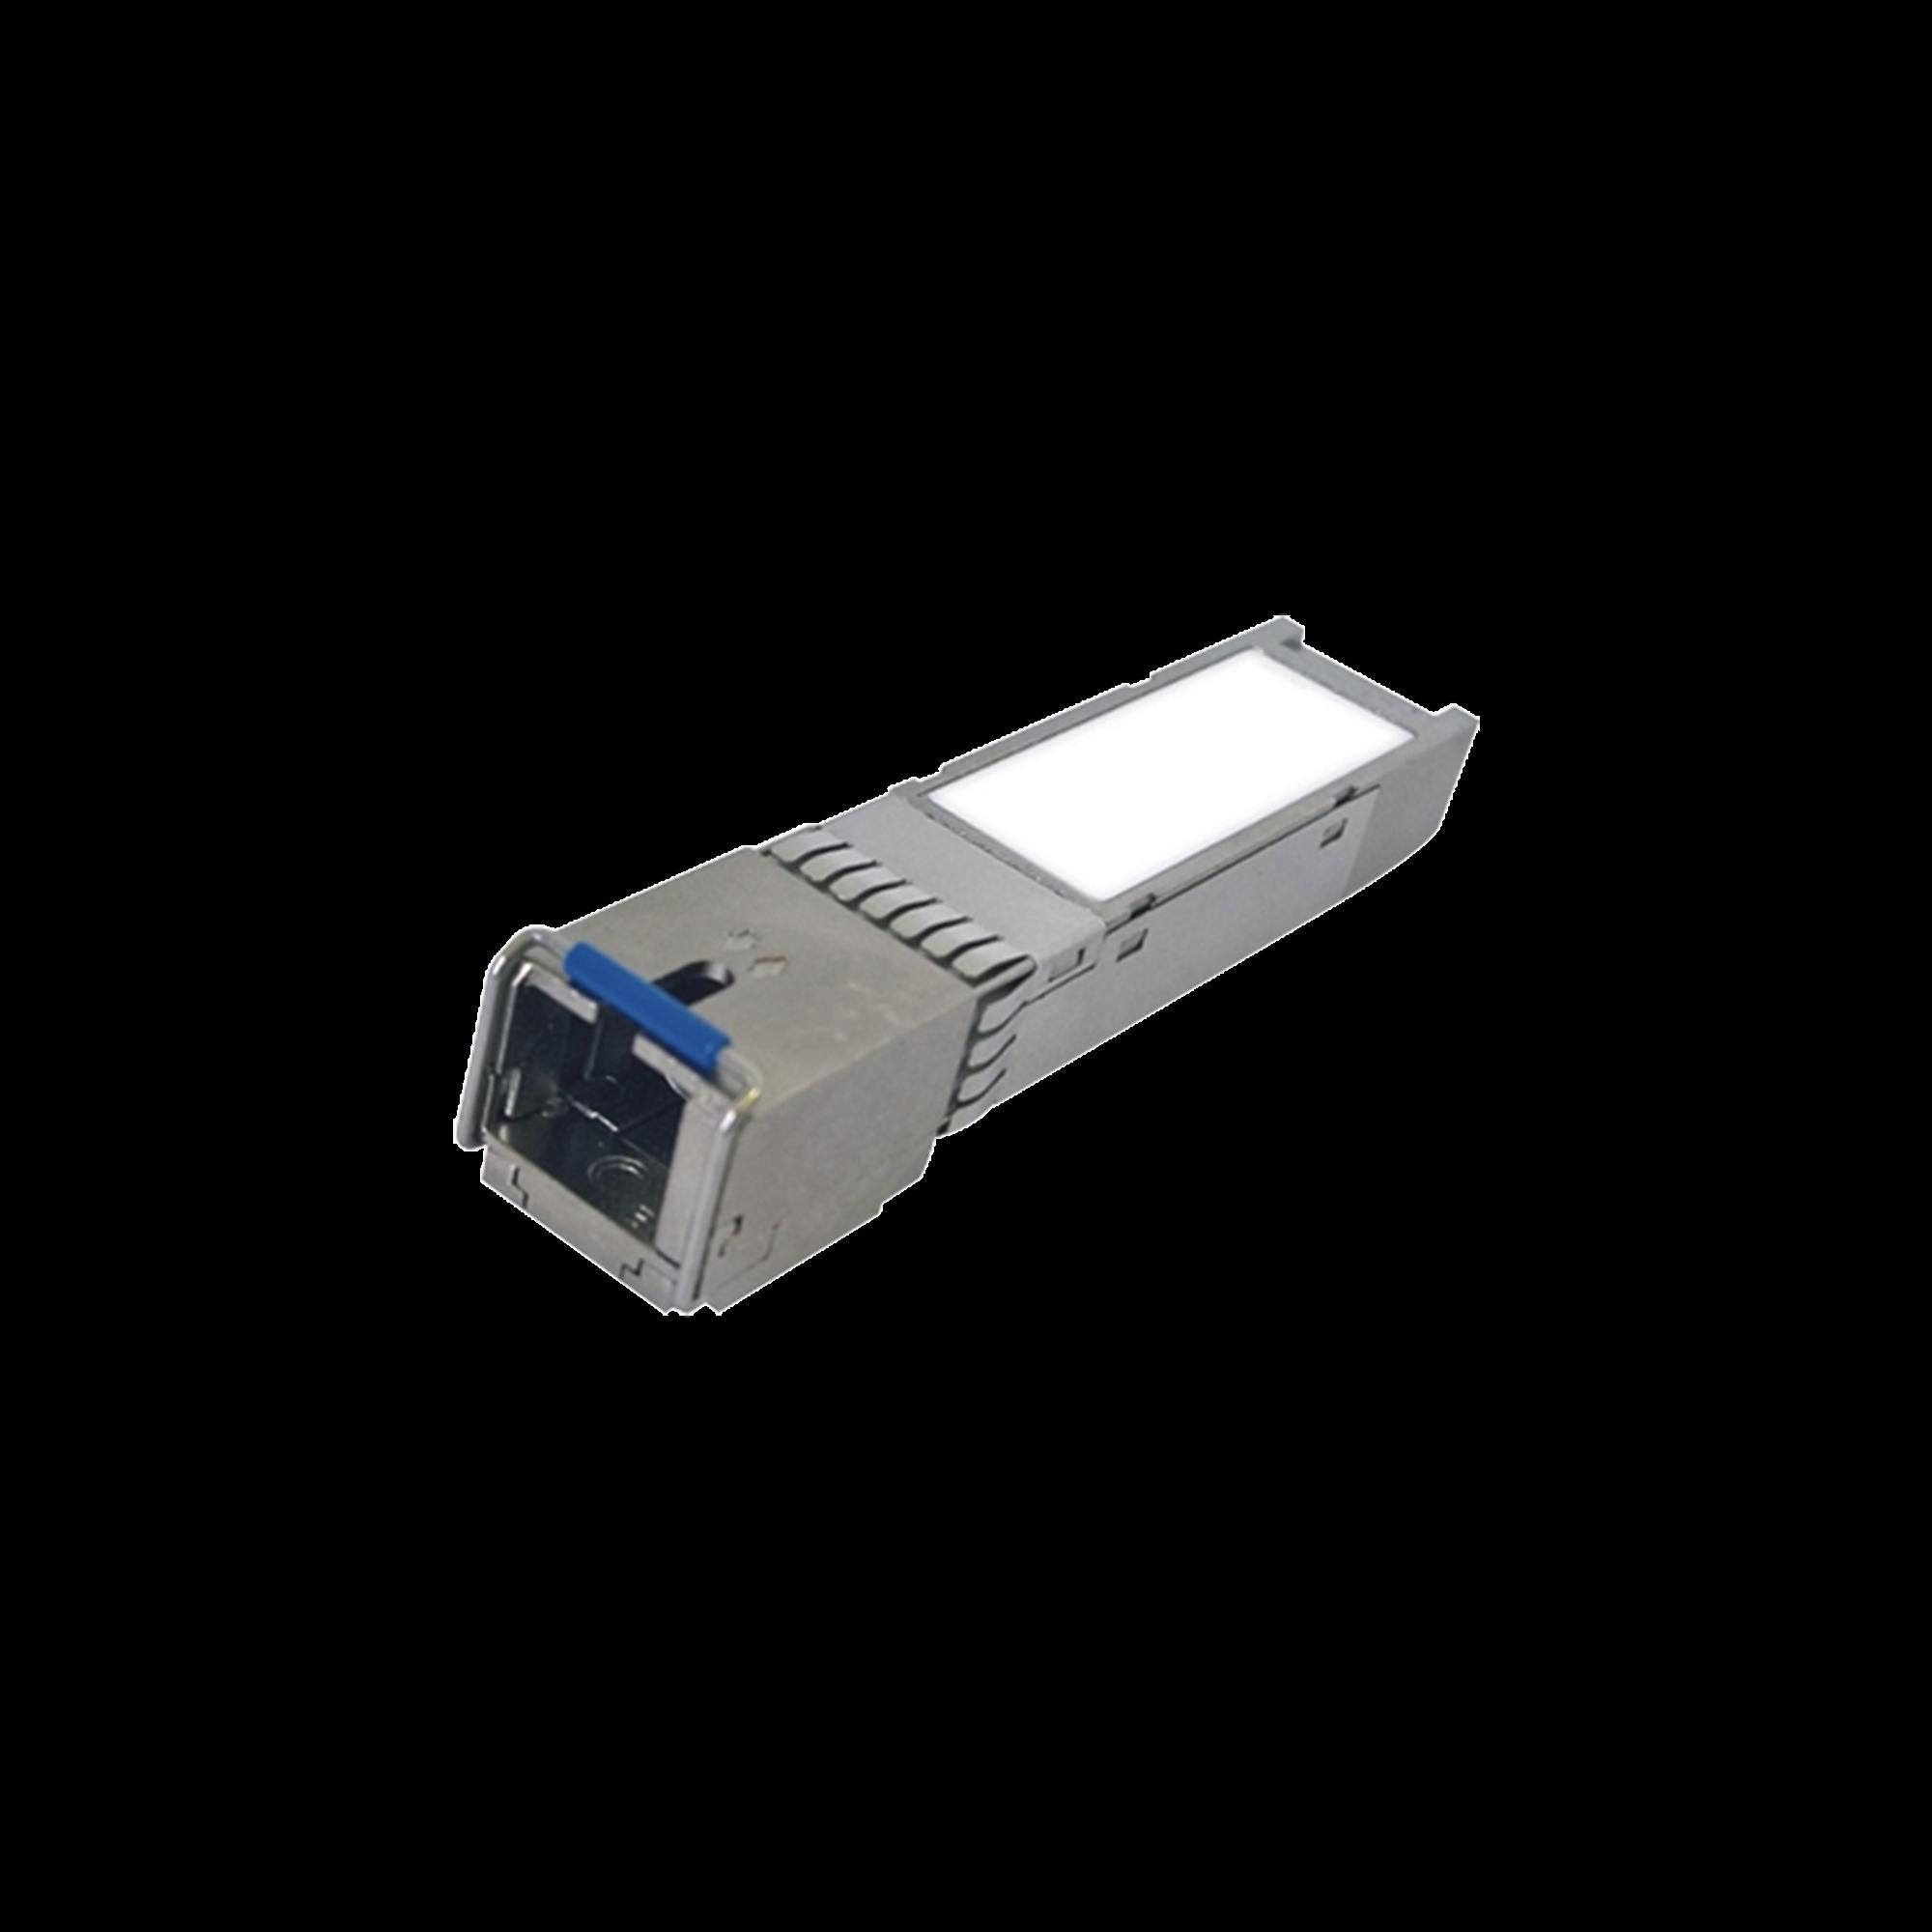 Módulo SFP GPON Class C+, con Conector SC/PC, Hasta 20Km